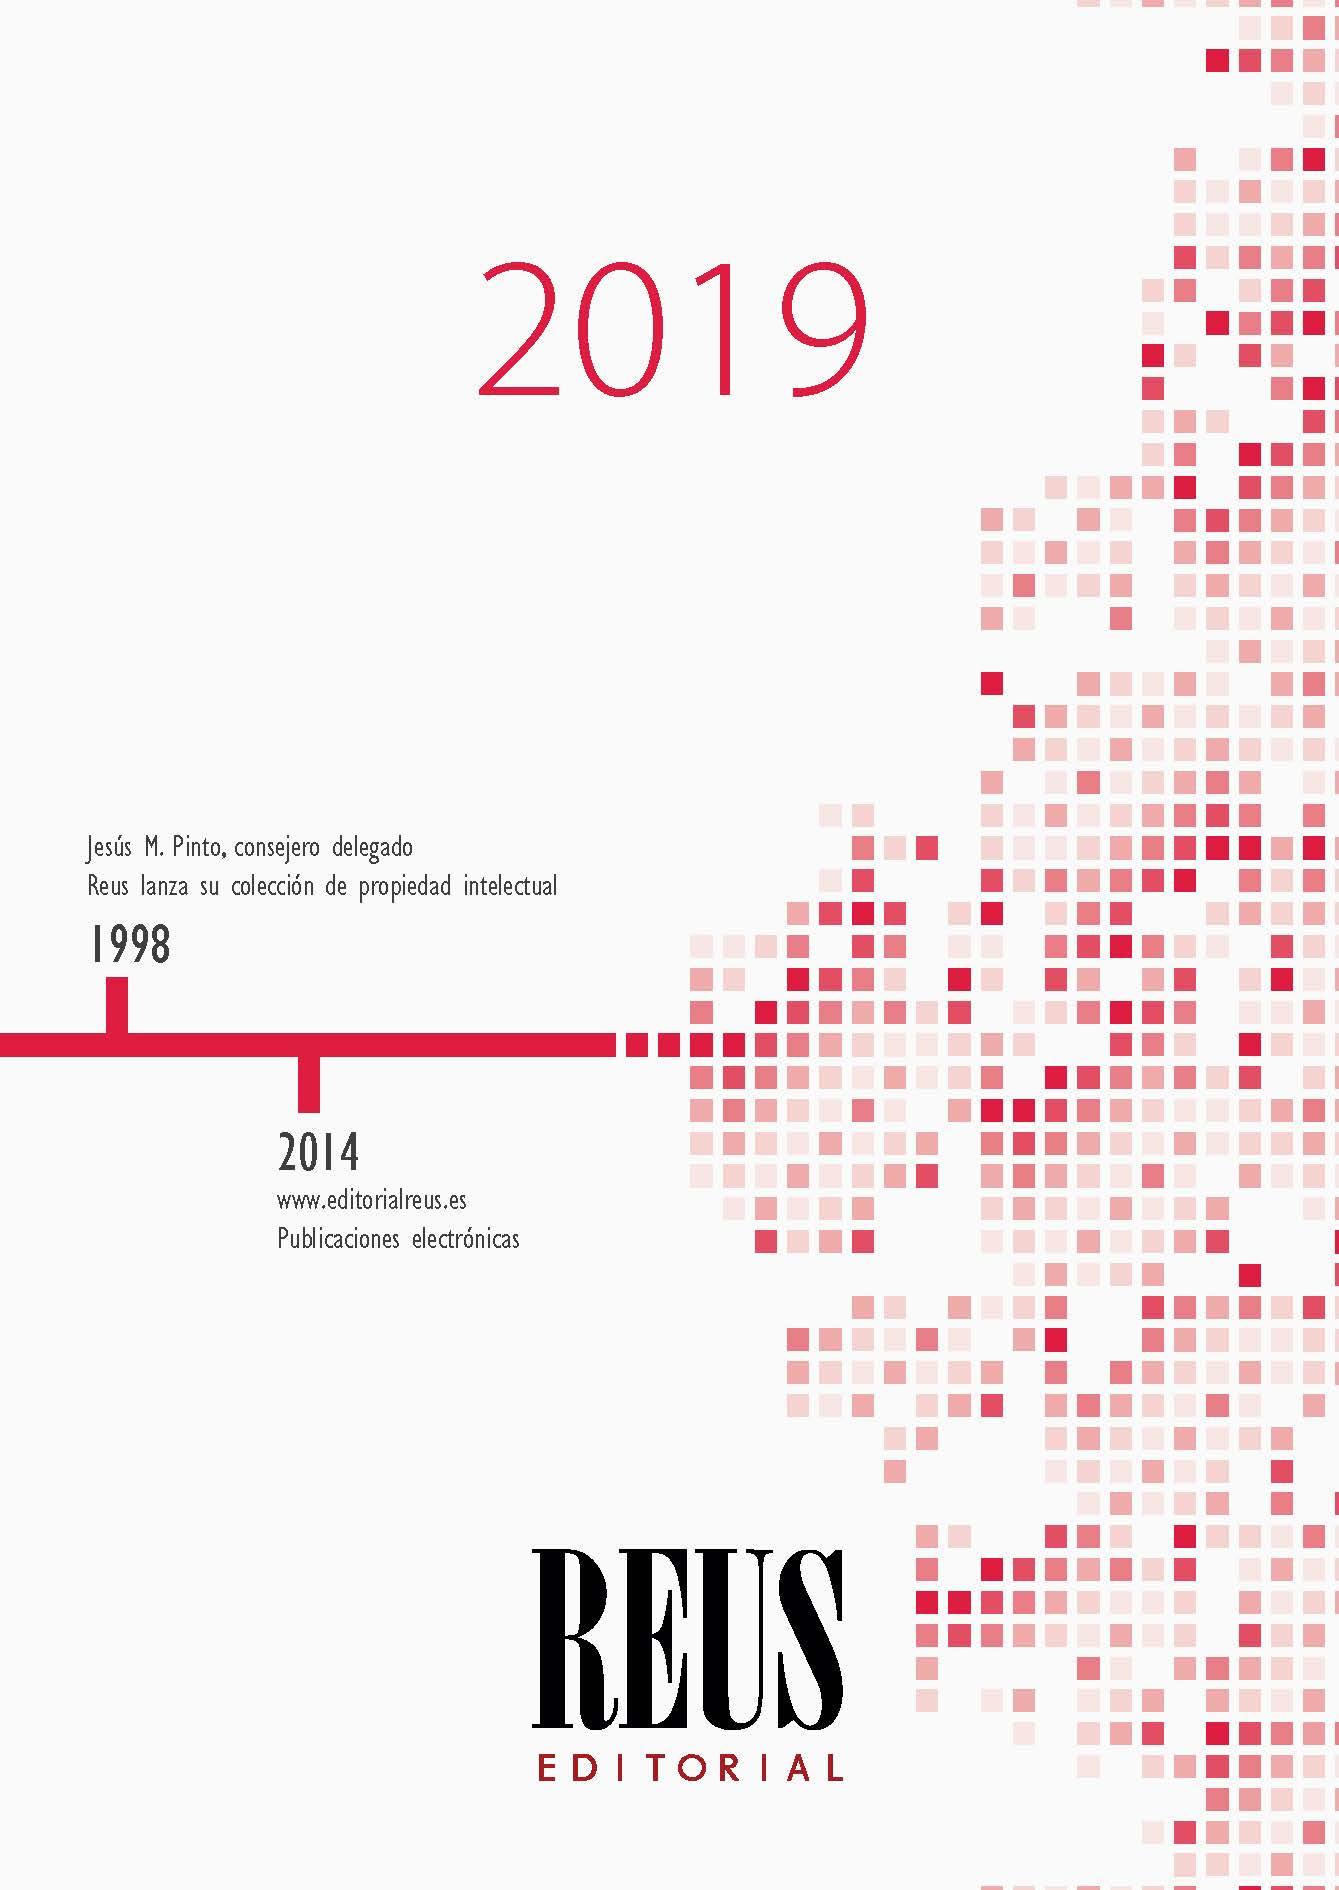 Cover_catalogo_editorial_reus_2019